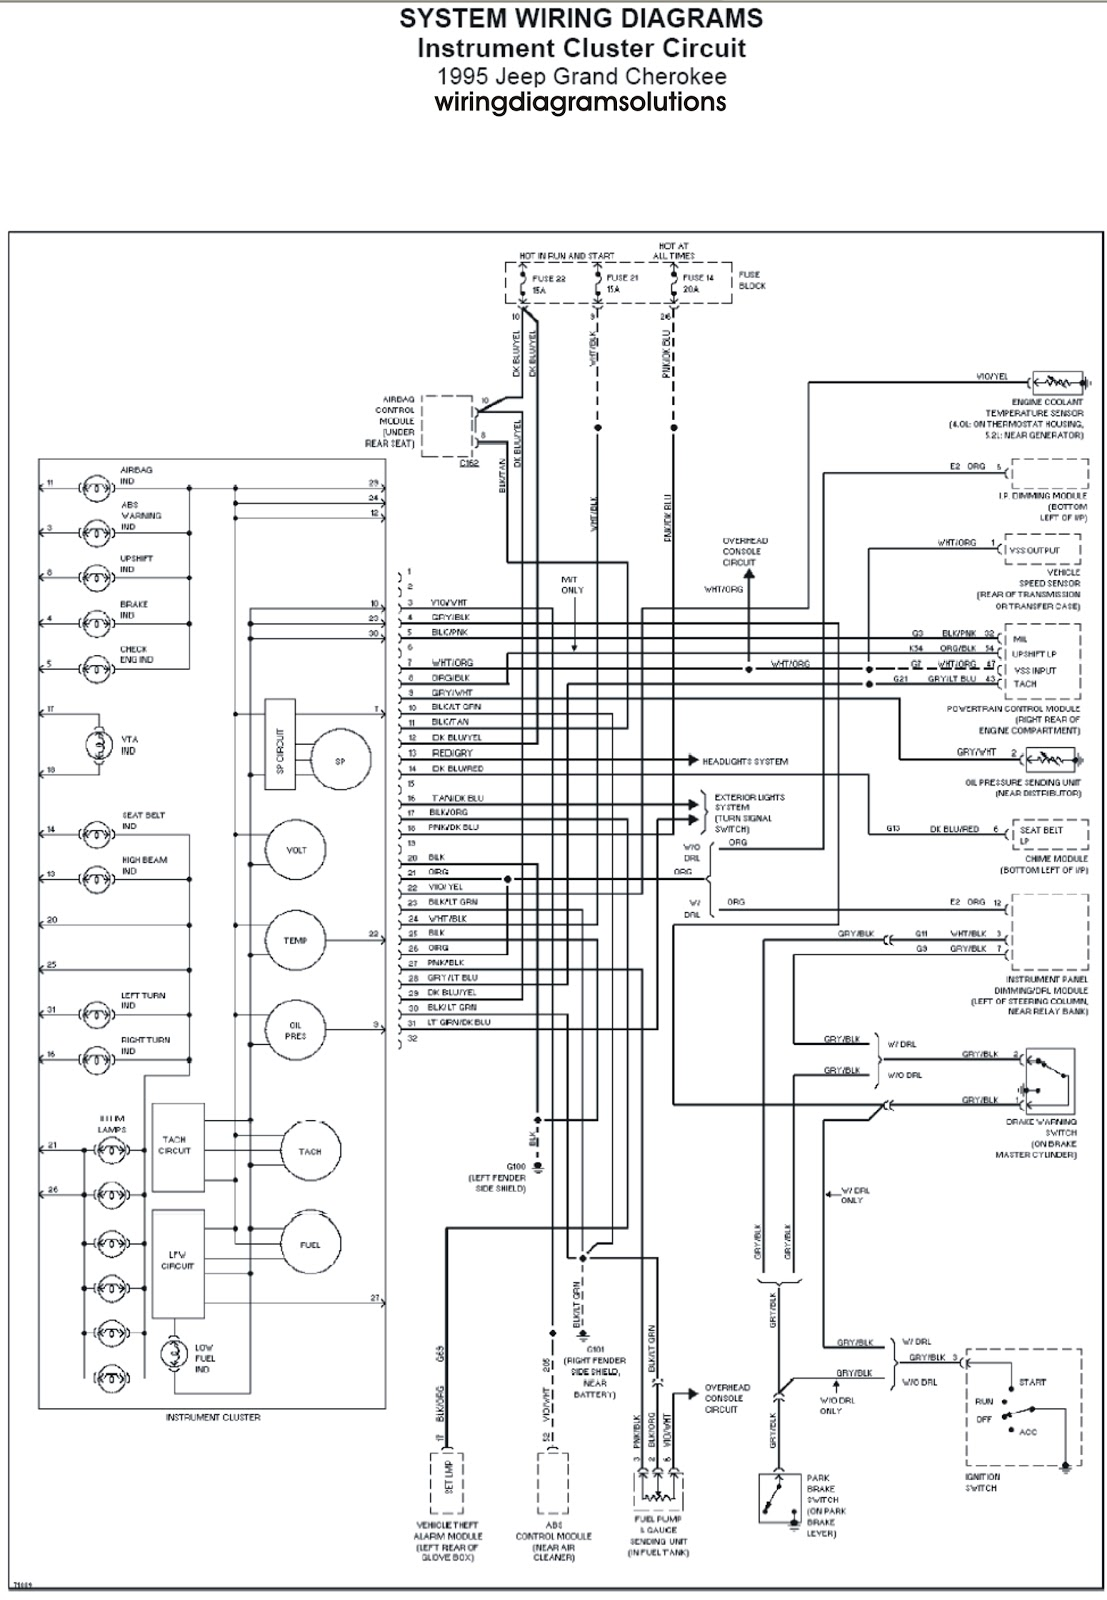 2000 Jeep Cherokee Power Window Wiring Diagram - Wiring Diagrams Jeep Cherokee Power Windows Wiring Diagram on